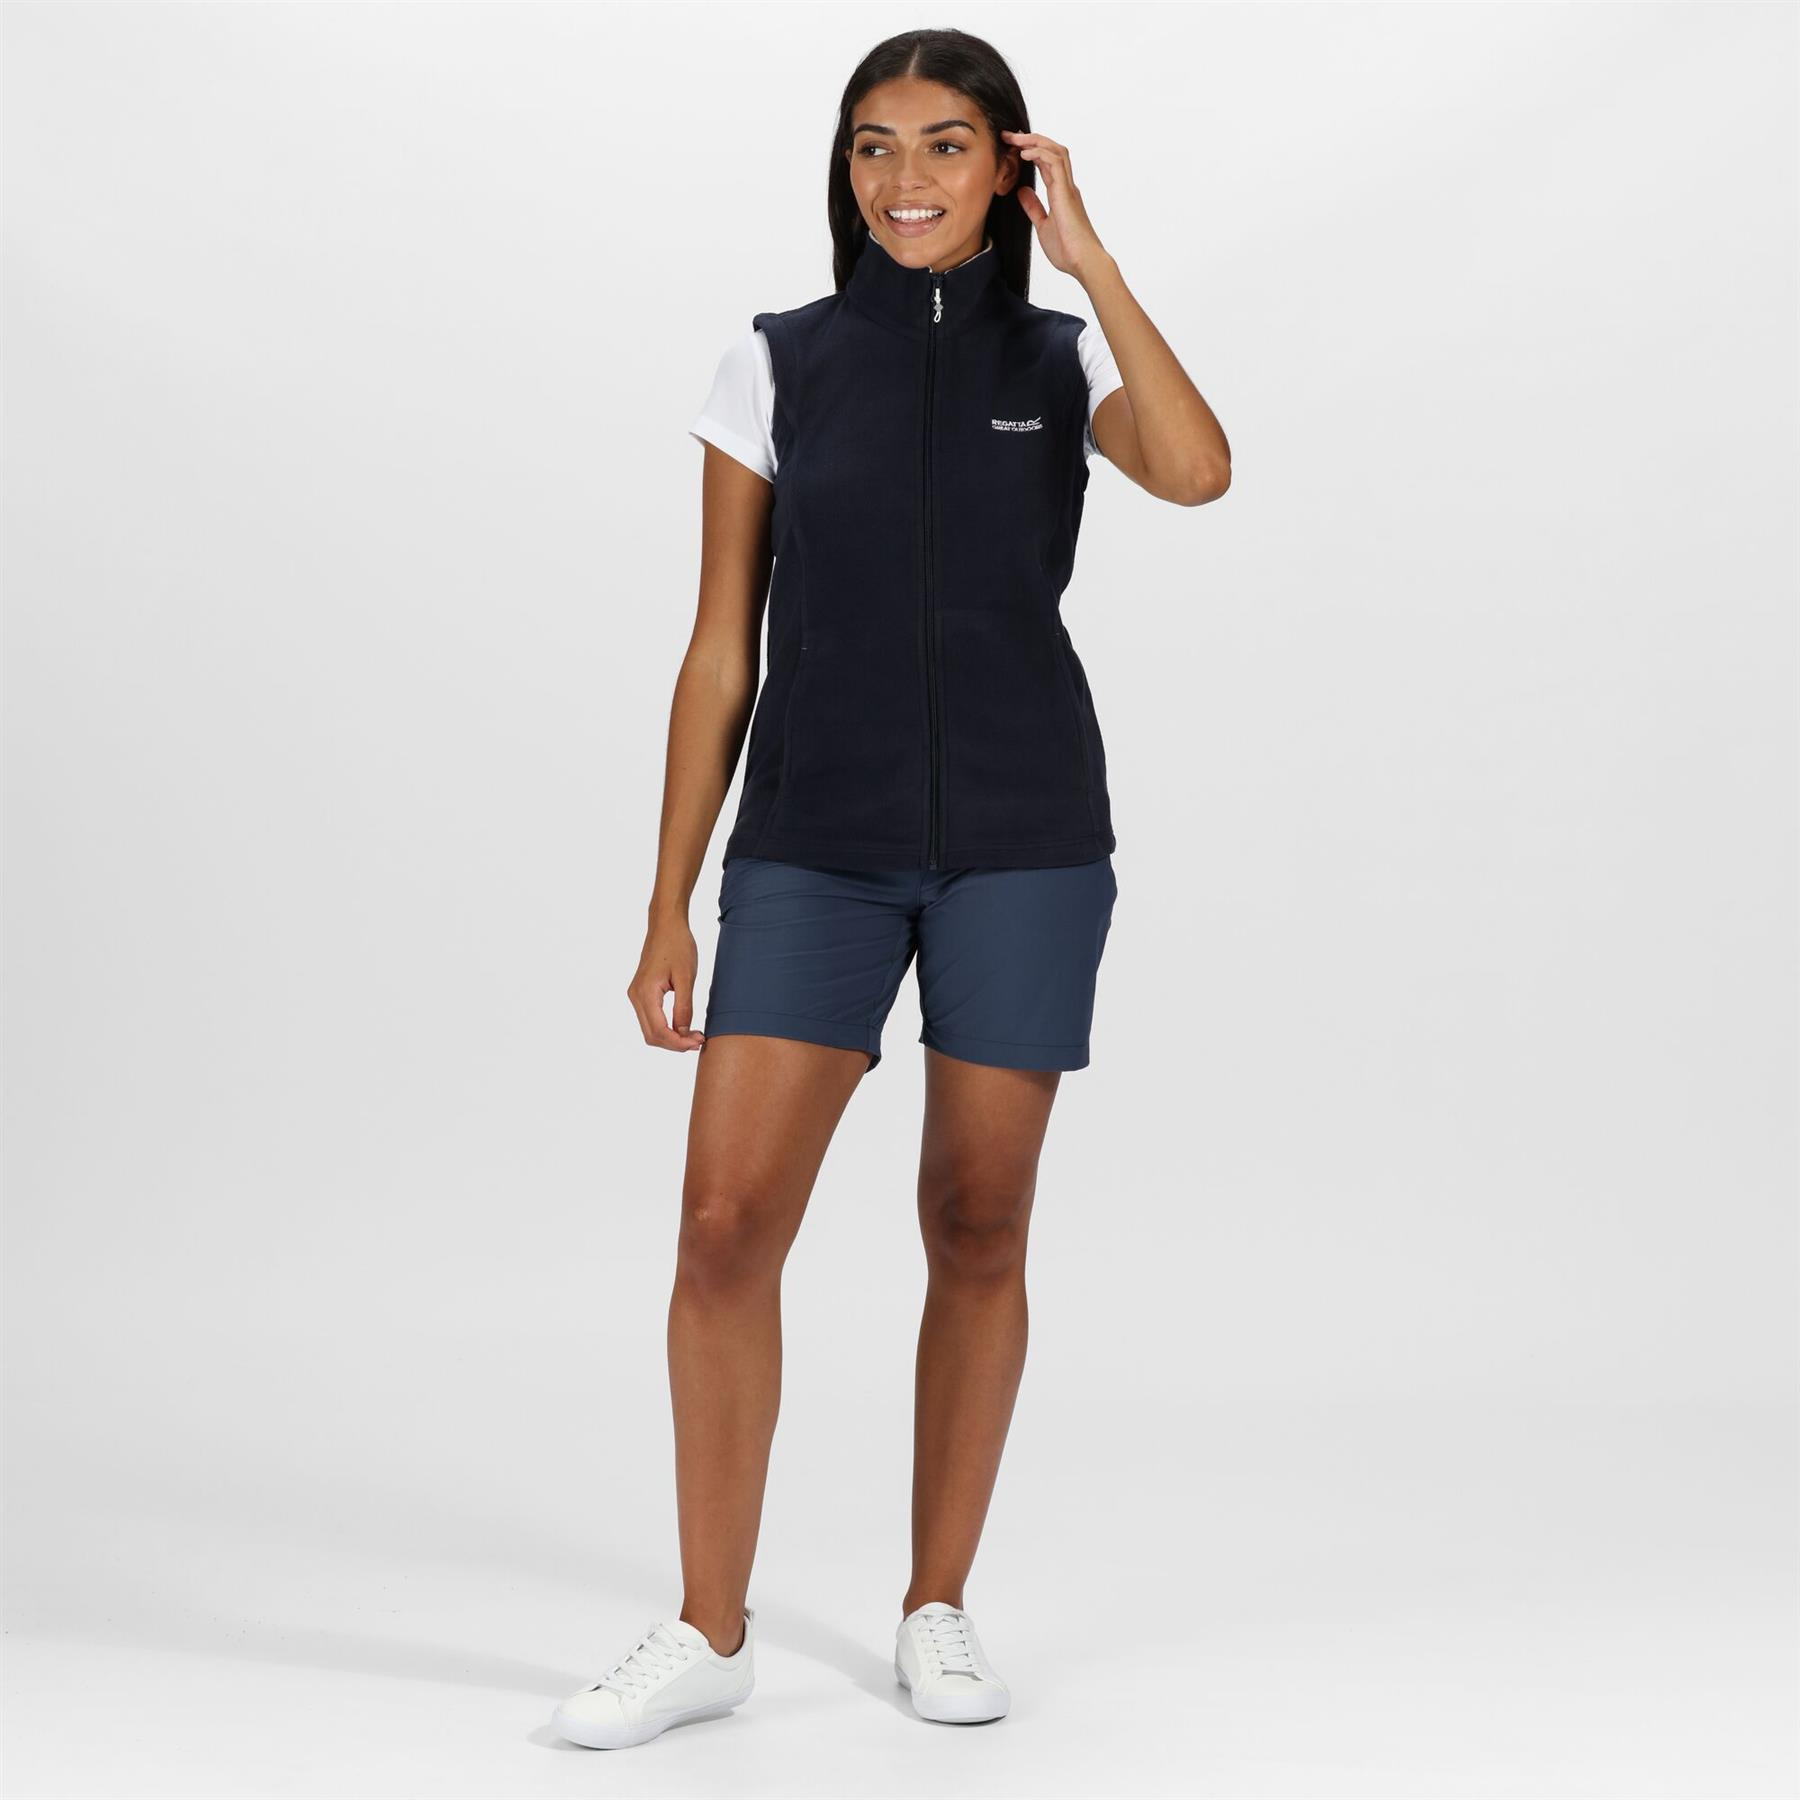 miniatuur 14 - Regatta Womens Sweetness Full Zip Micro Fleece Casual Bodywarmer Waistcoat